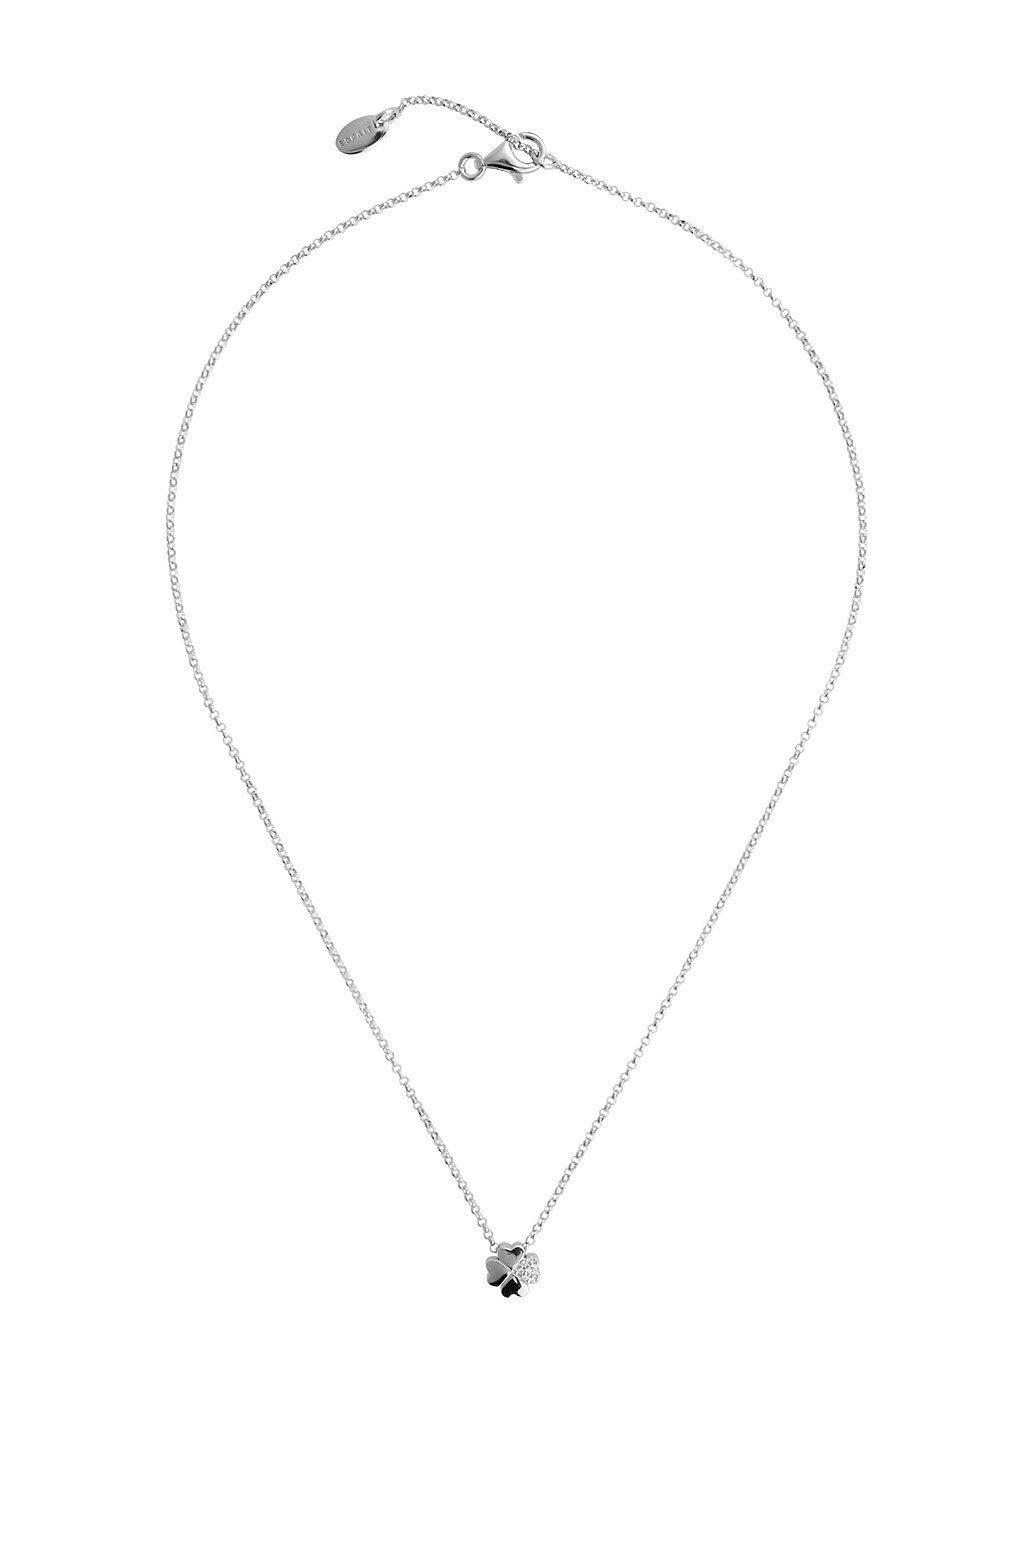 ESPRIT CASUAL Sterling Silber / Zirkonia Kette